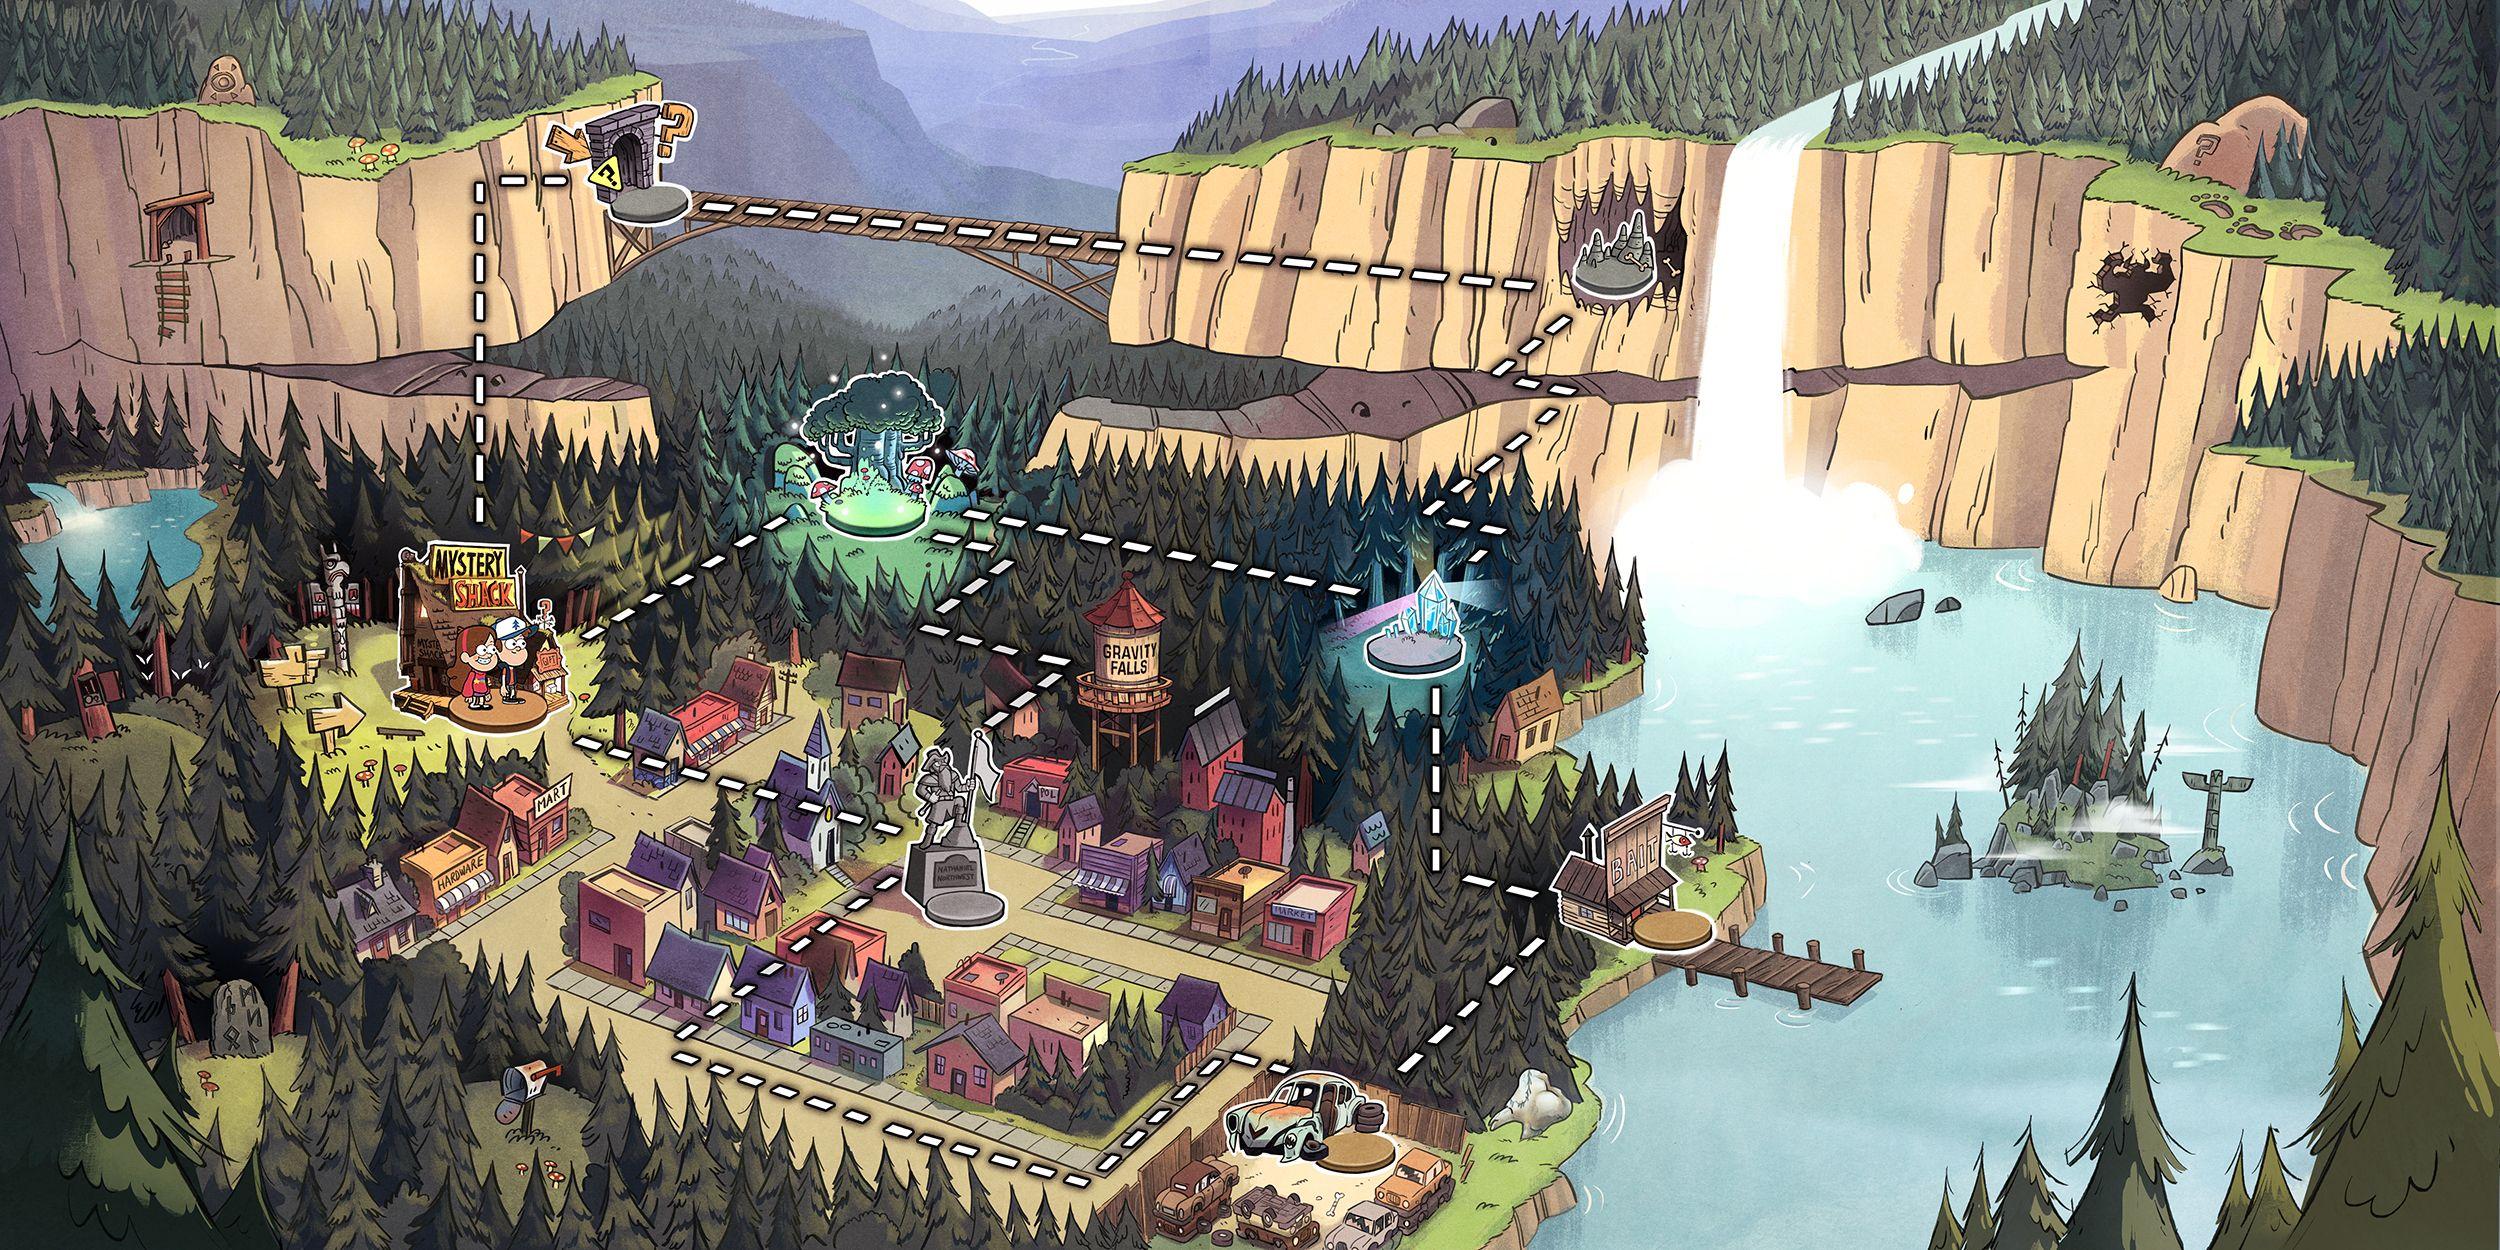 20 Gravity Falls Hd Wallpapers Backgrounds Wallpaper Abyss Gravity Falls Town Gravity Falls Gravity Falls Art